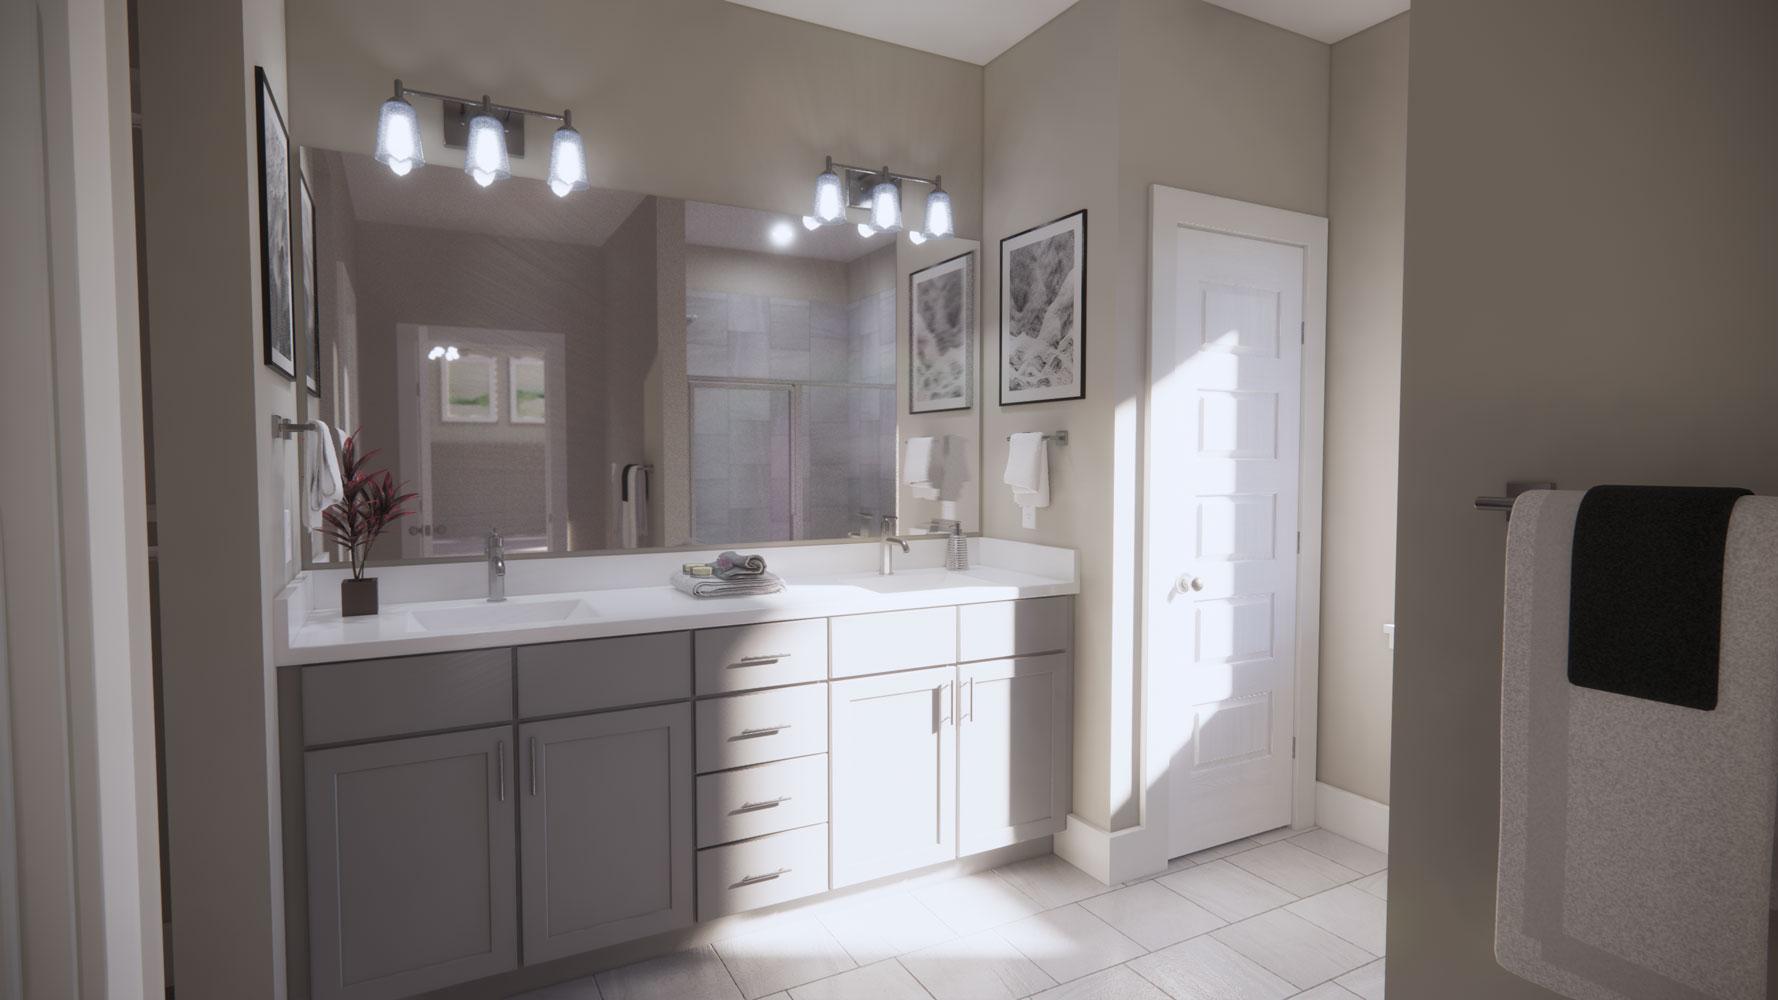 Bathroom Vanities at Echelon at Reverchon Bluffs in Dallas, Texas